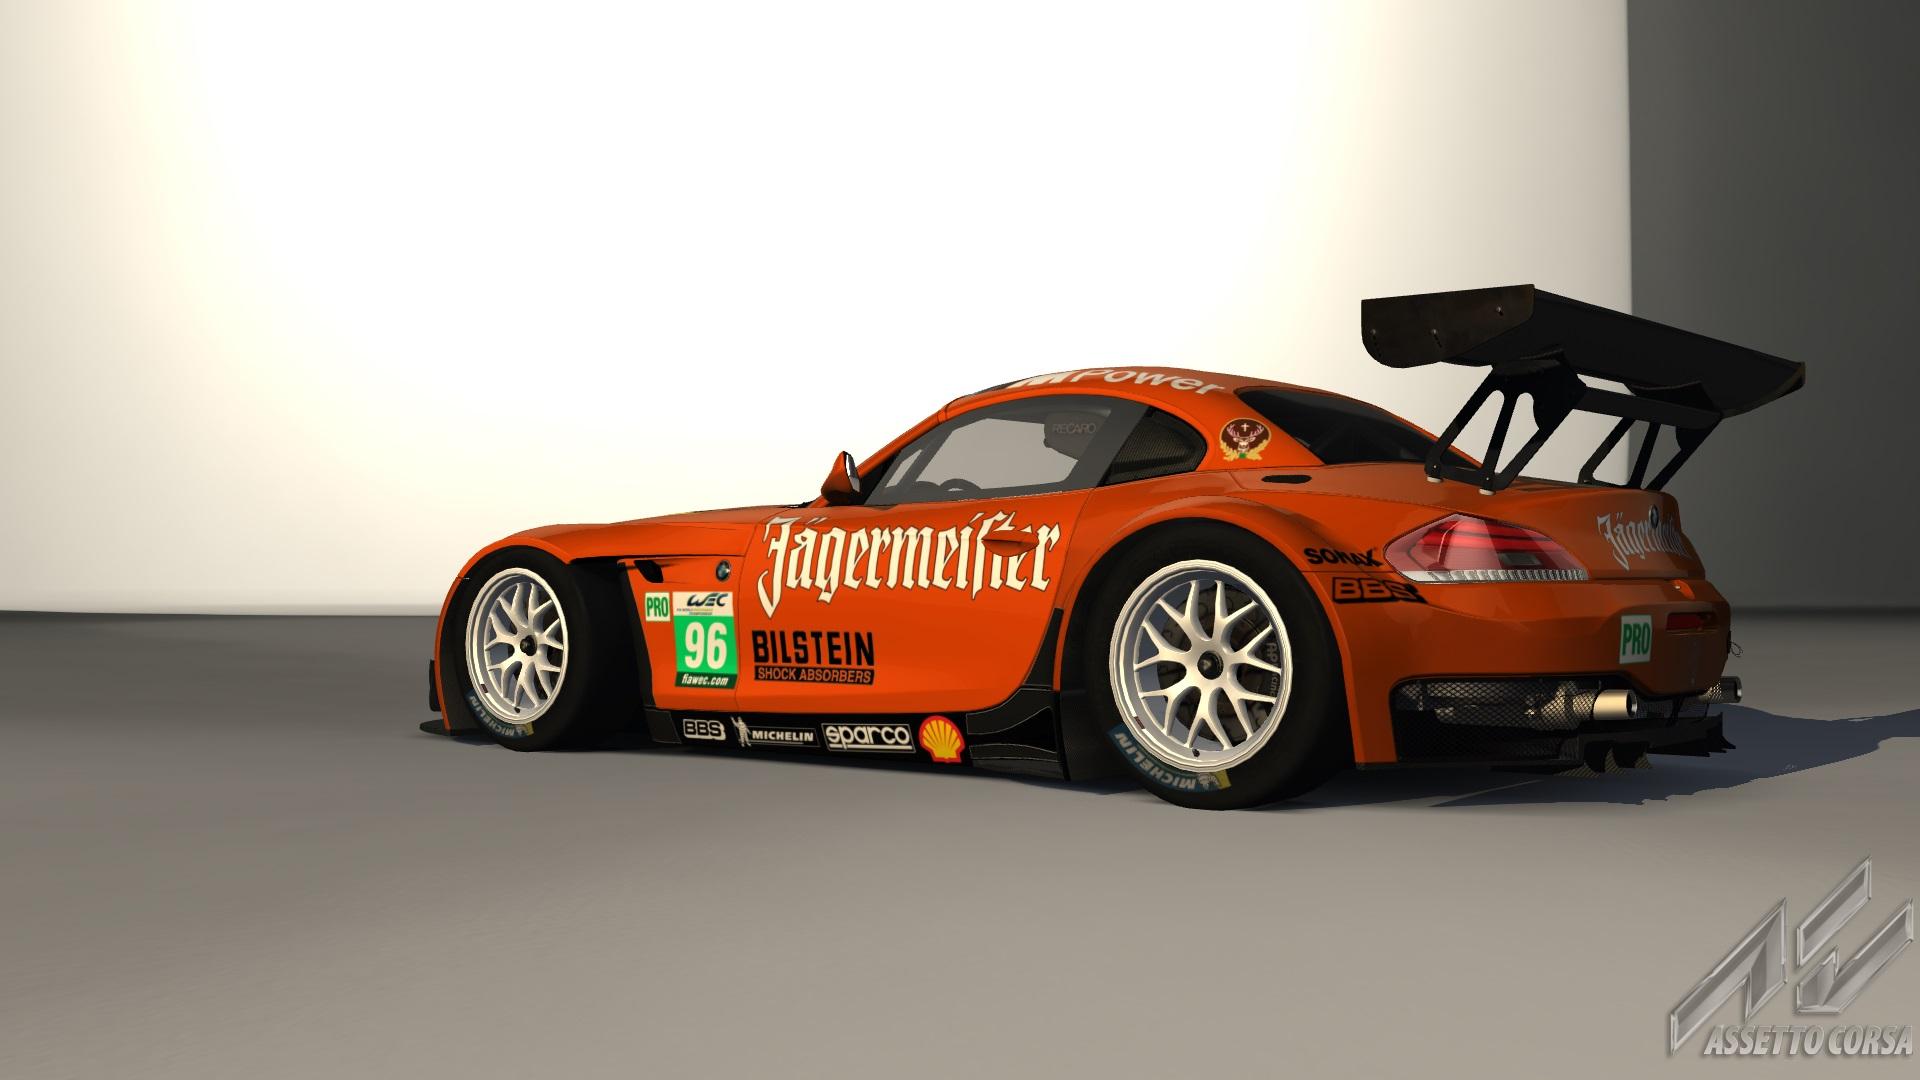 Jagermeister Bmw Z4 Gt3 Racedepartment Latest Formula